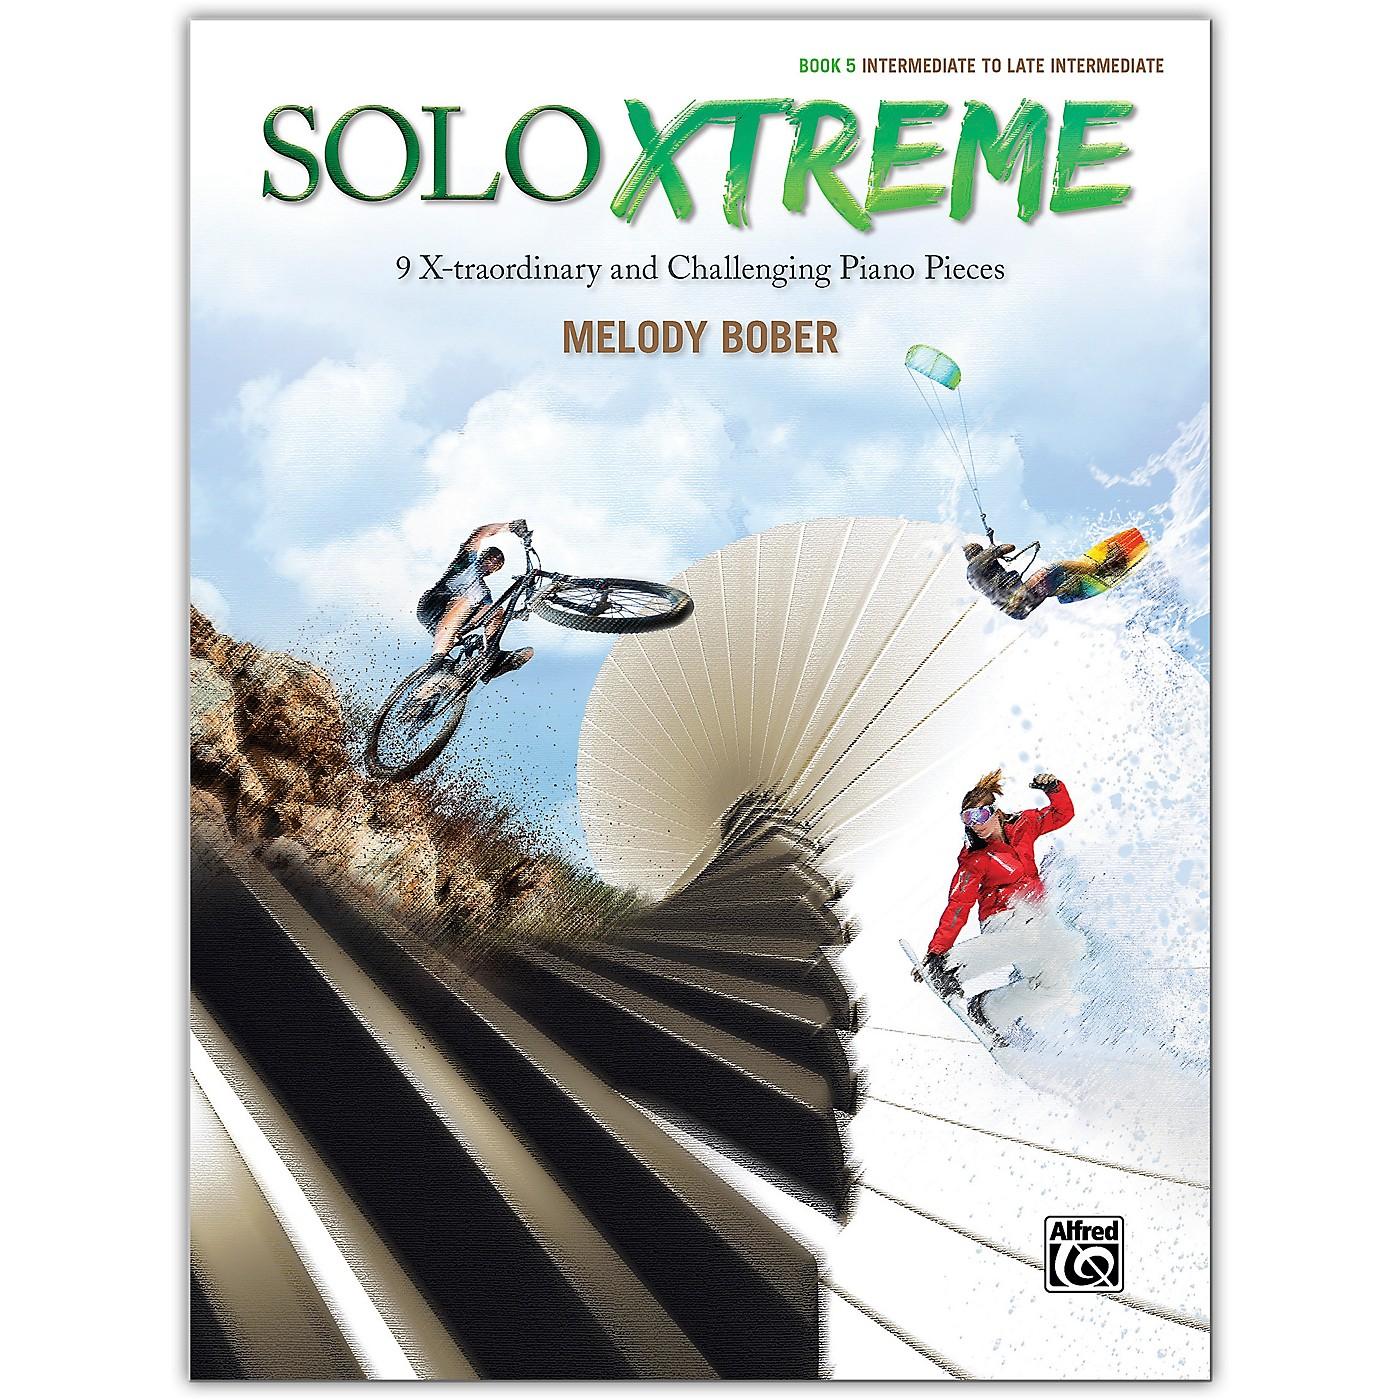 Alfred Solo Xtreme, Book 5 Intermediate / Late Intermediate thumbnail